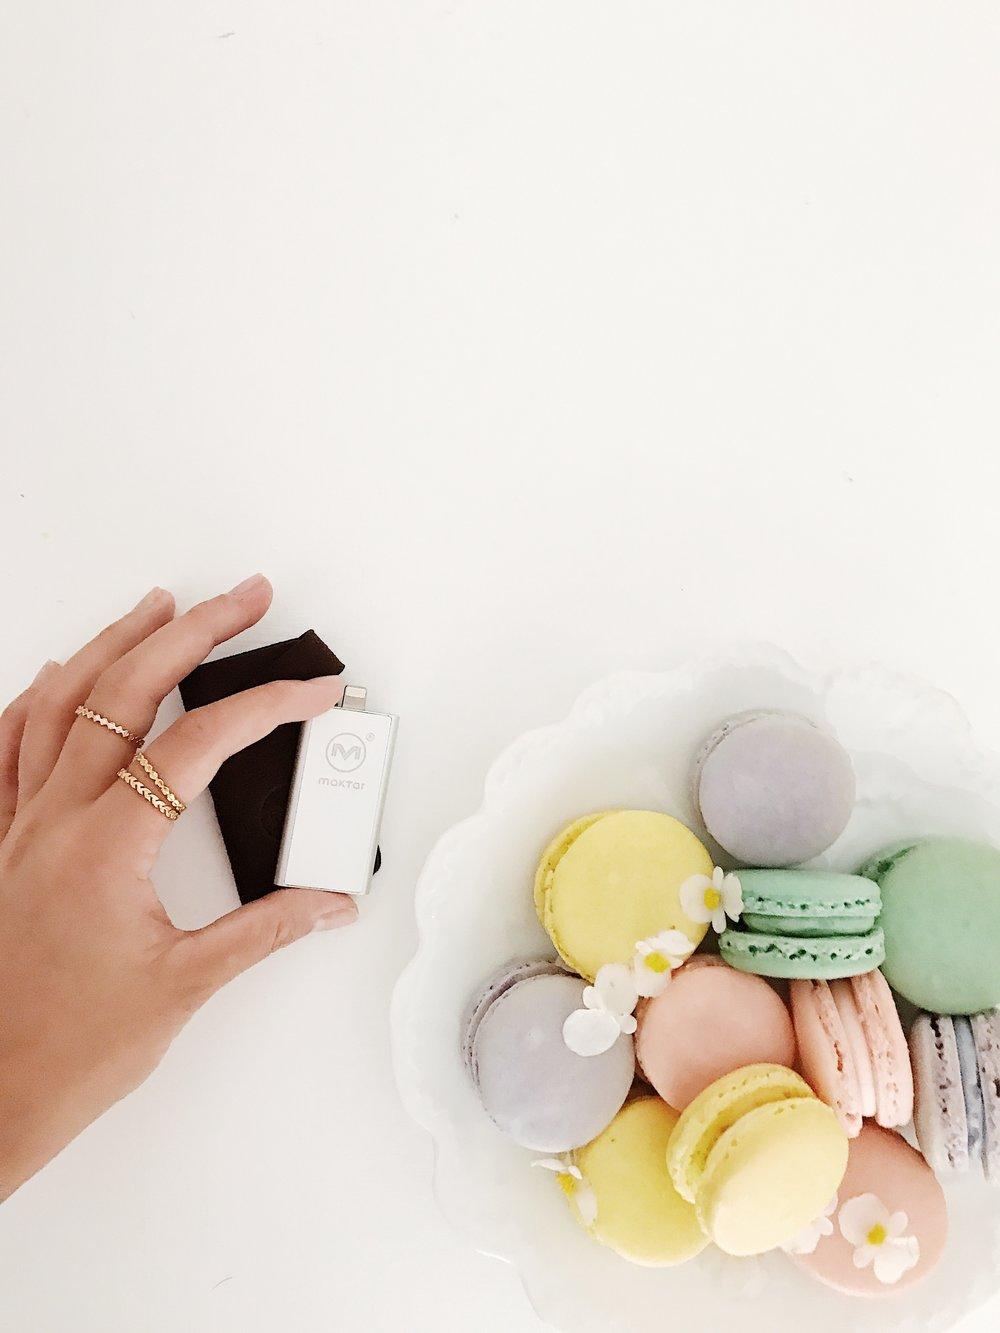 Piconizer iphone memory stick expander addition